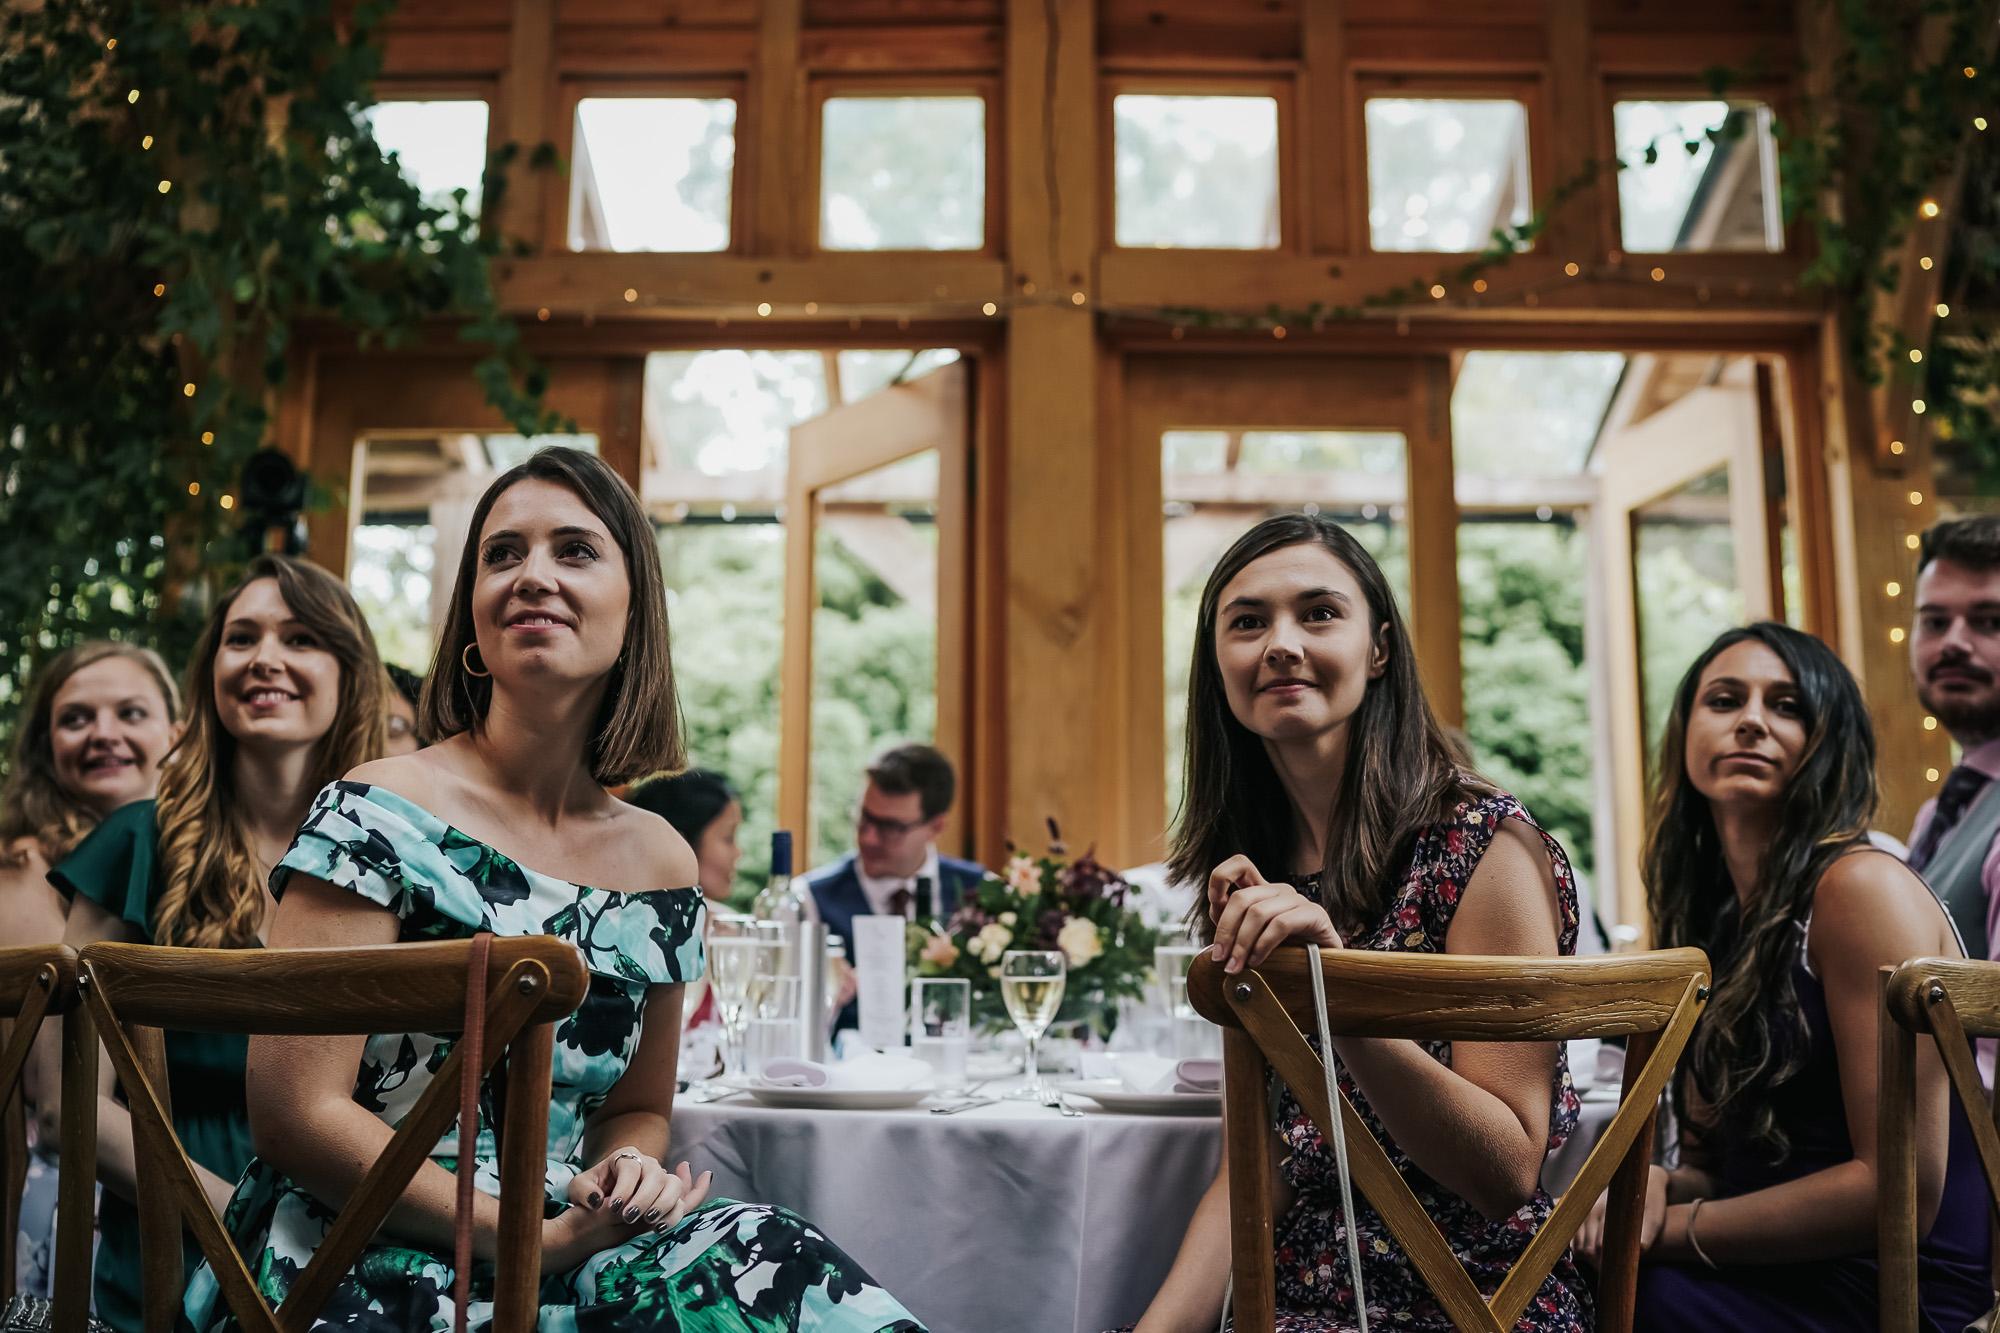 Oak tree of peover wedding photography cheshire wedding photographer (43 of 56).jpg